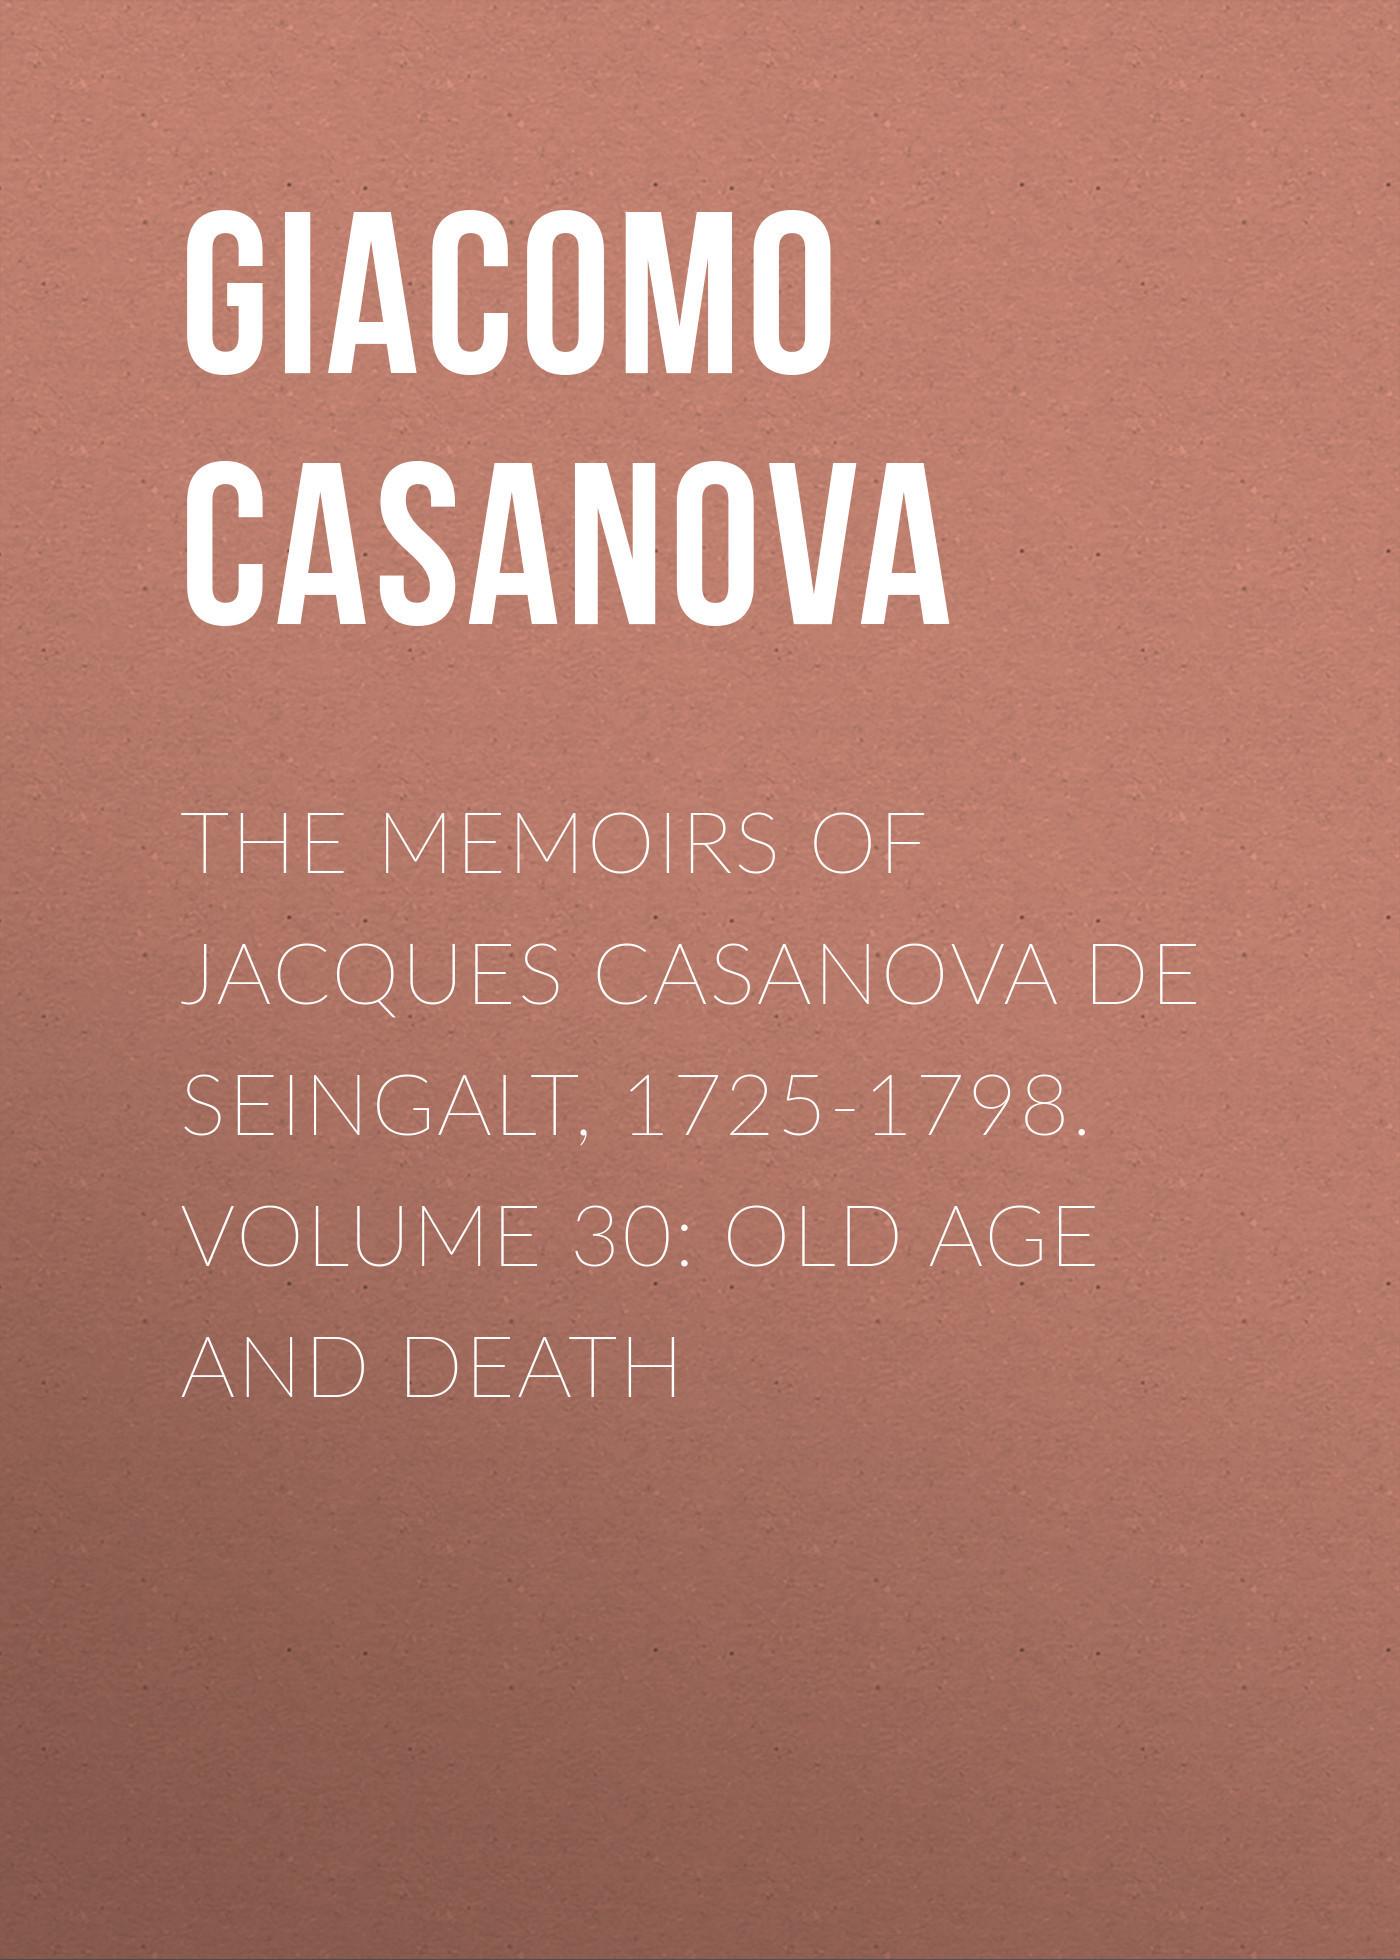 Giacomo Casanova The Memoirs of Jacques Casanova de Seingalt, 1725-1798. Volume 30: Old Age and Death ageing and old age